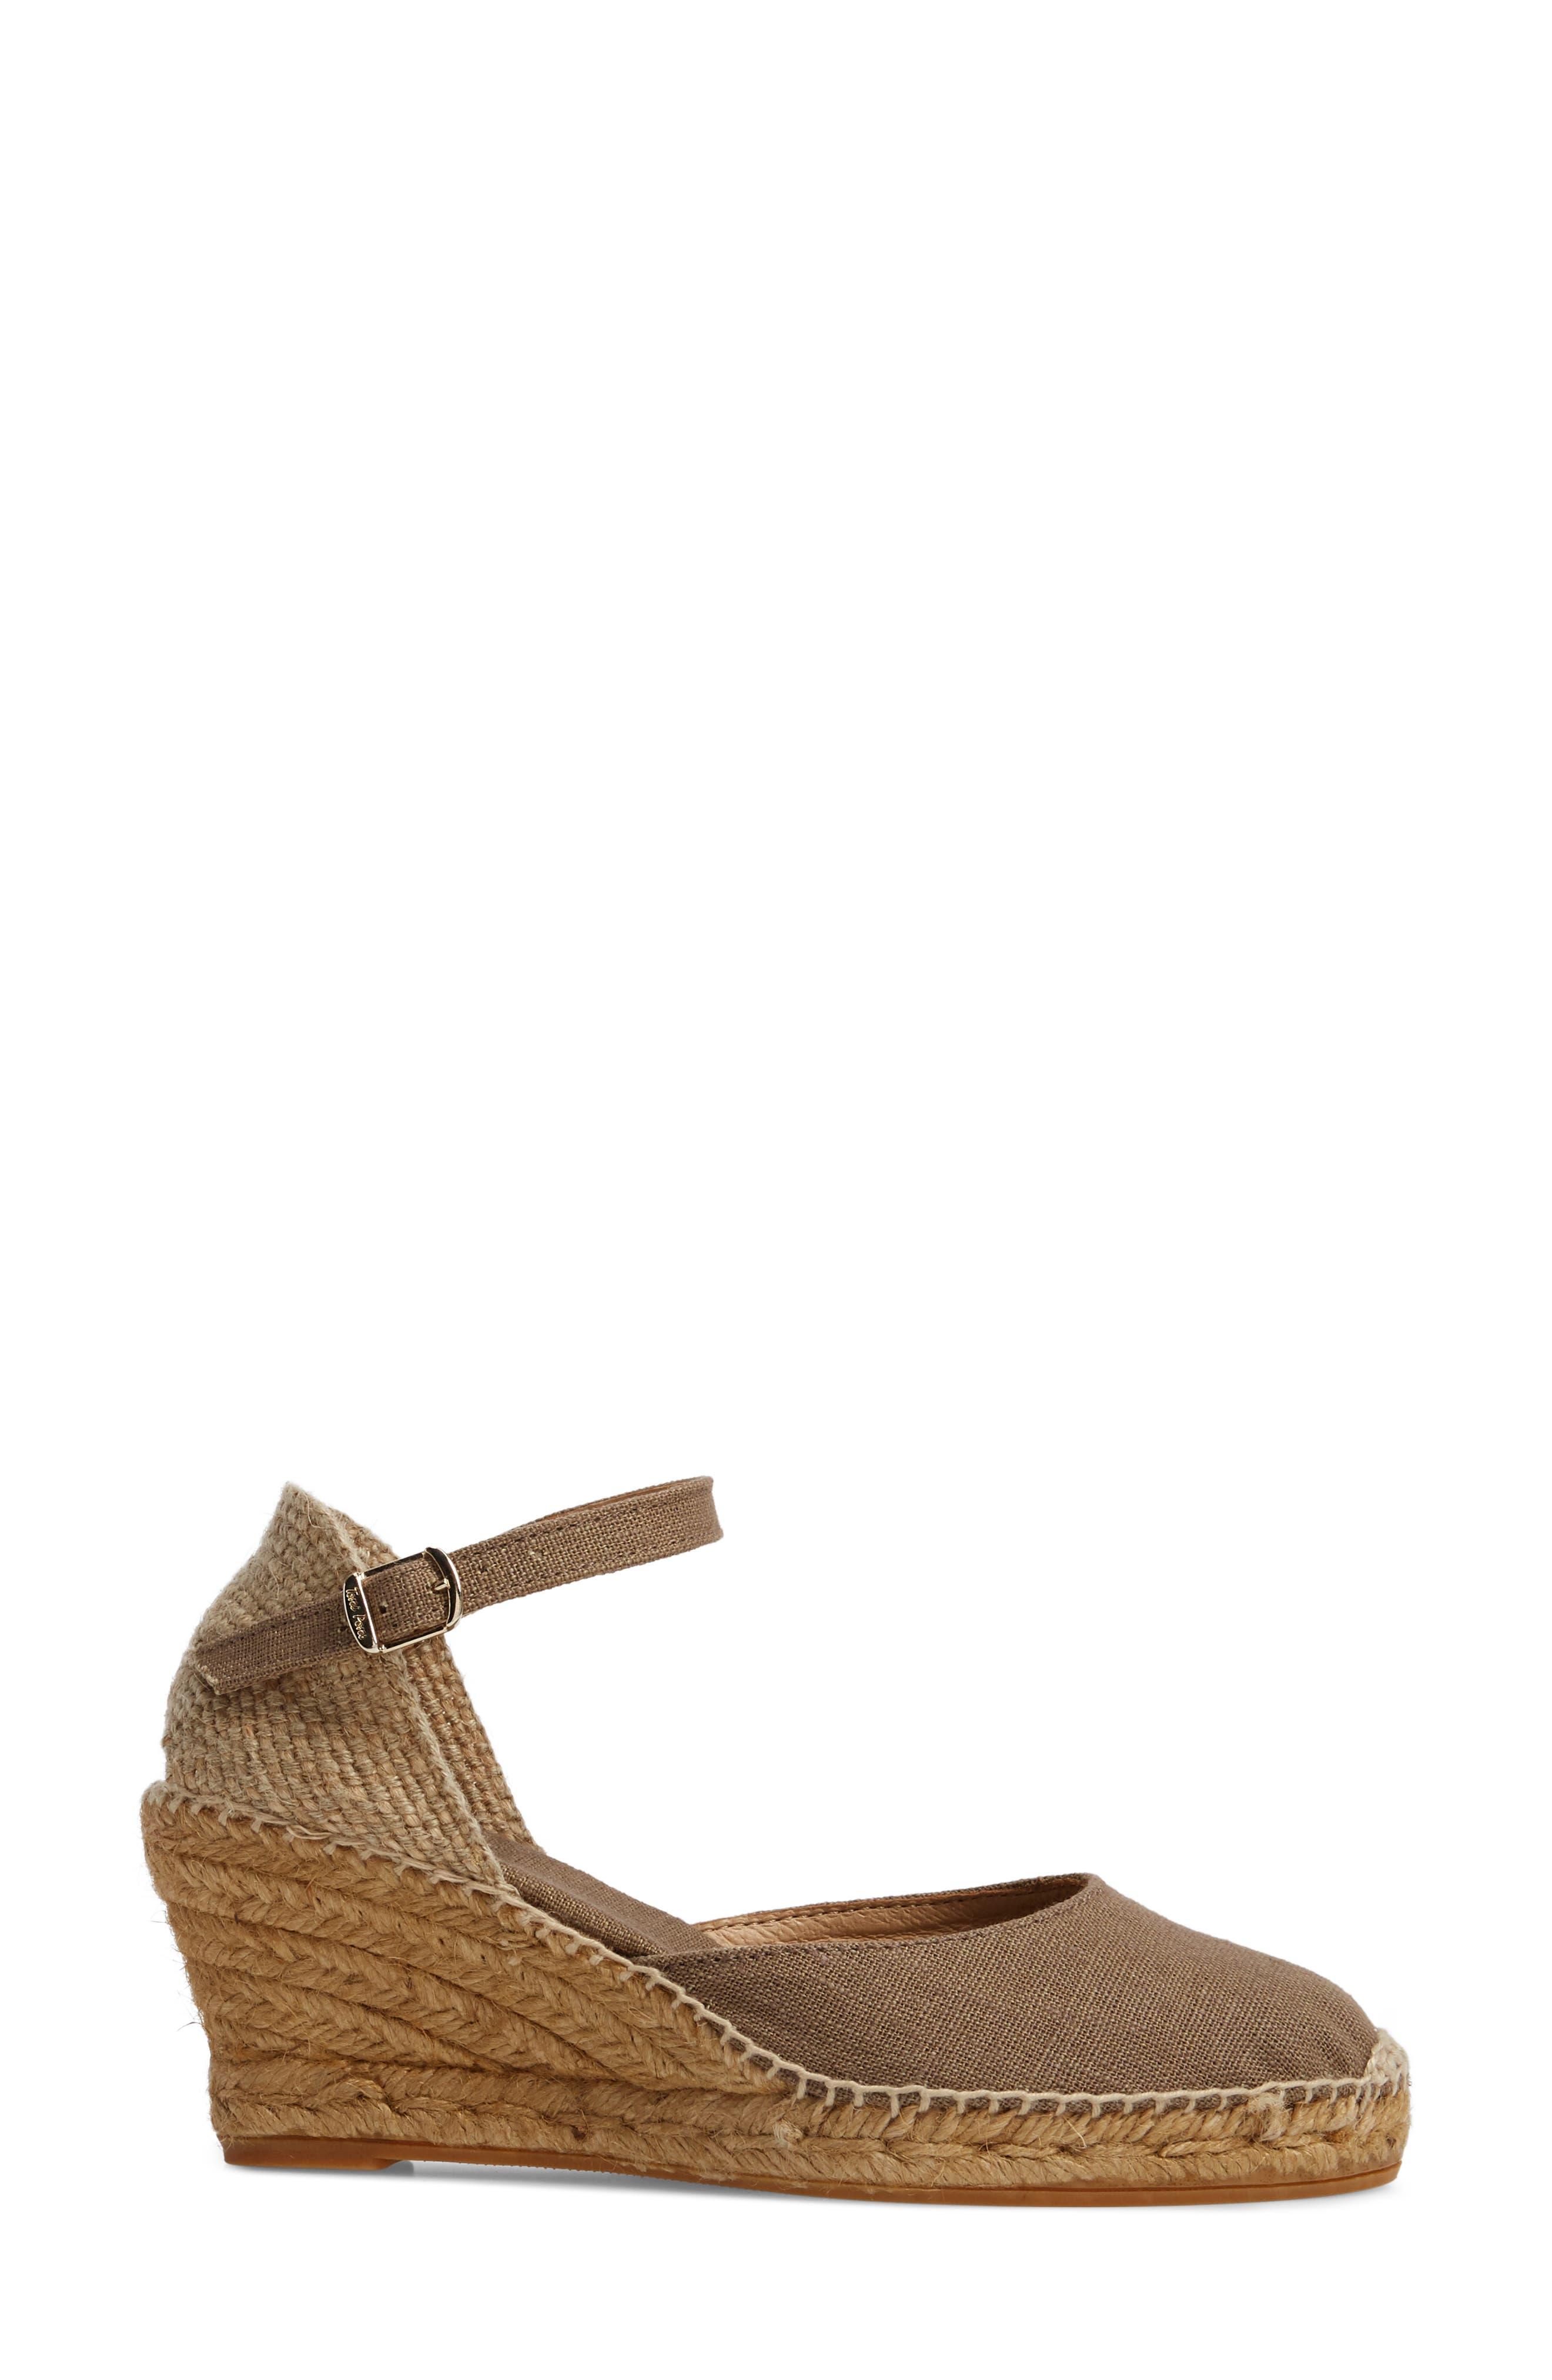 'Caldes' Linen Wedge Sandal,                             Alternate thumbnail 3, color,                             TAUPE FABRIC